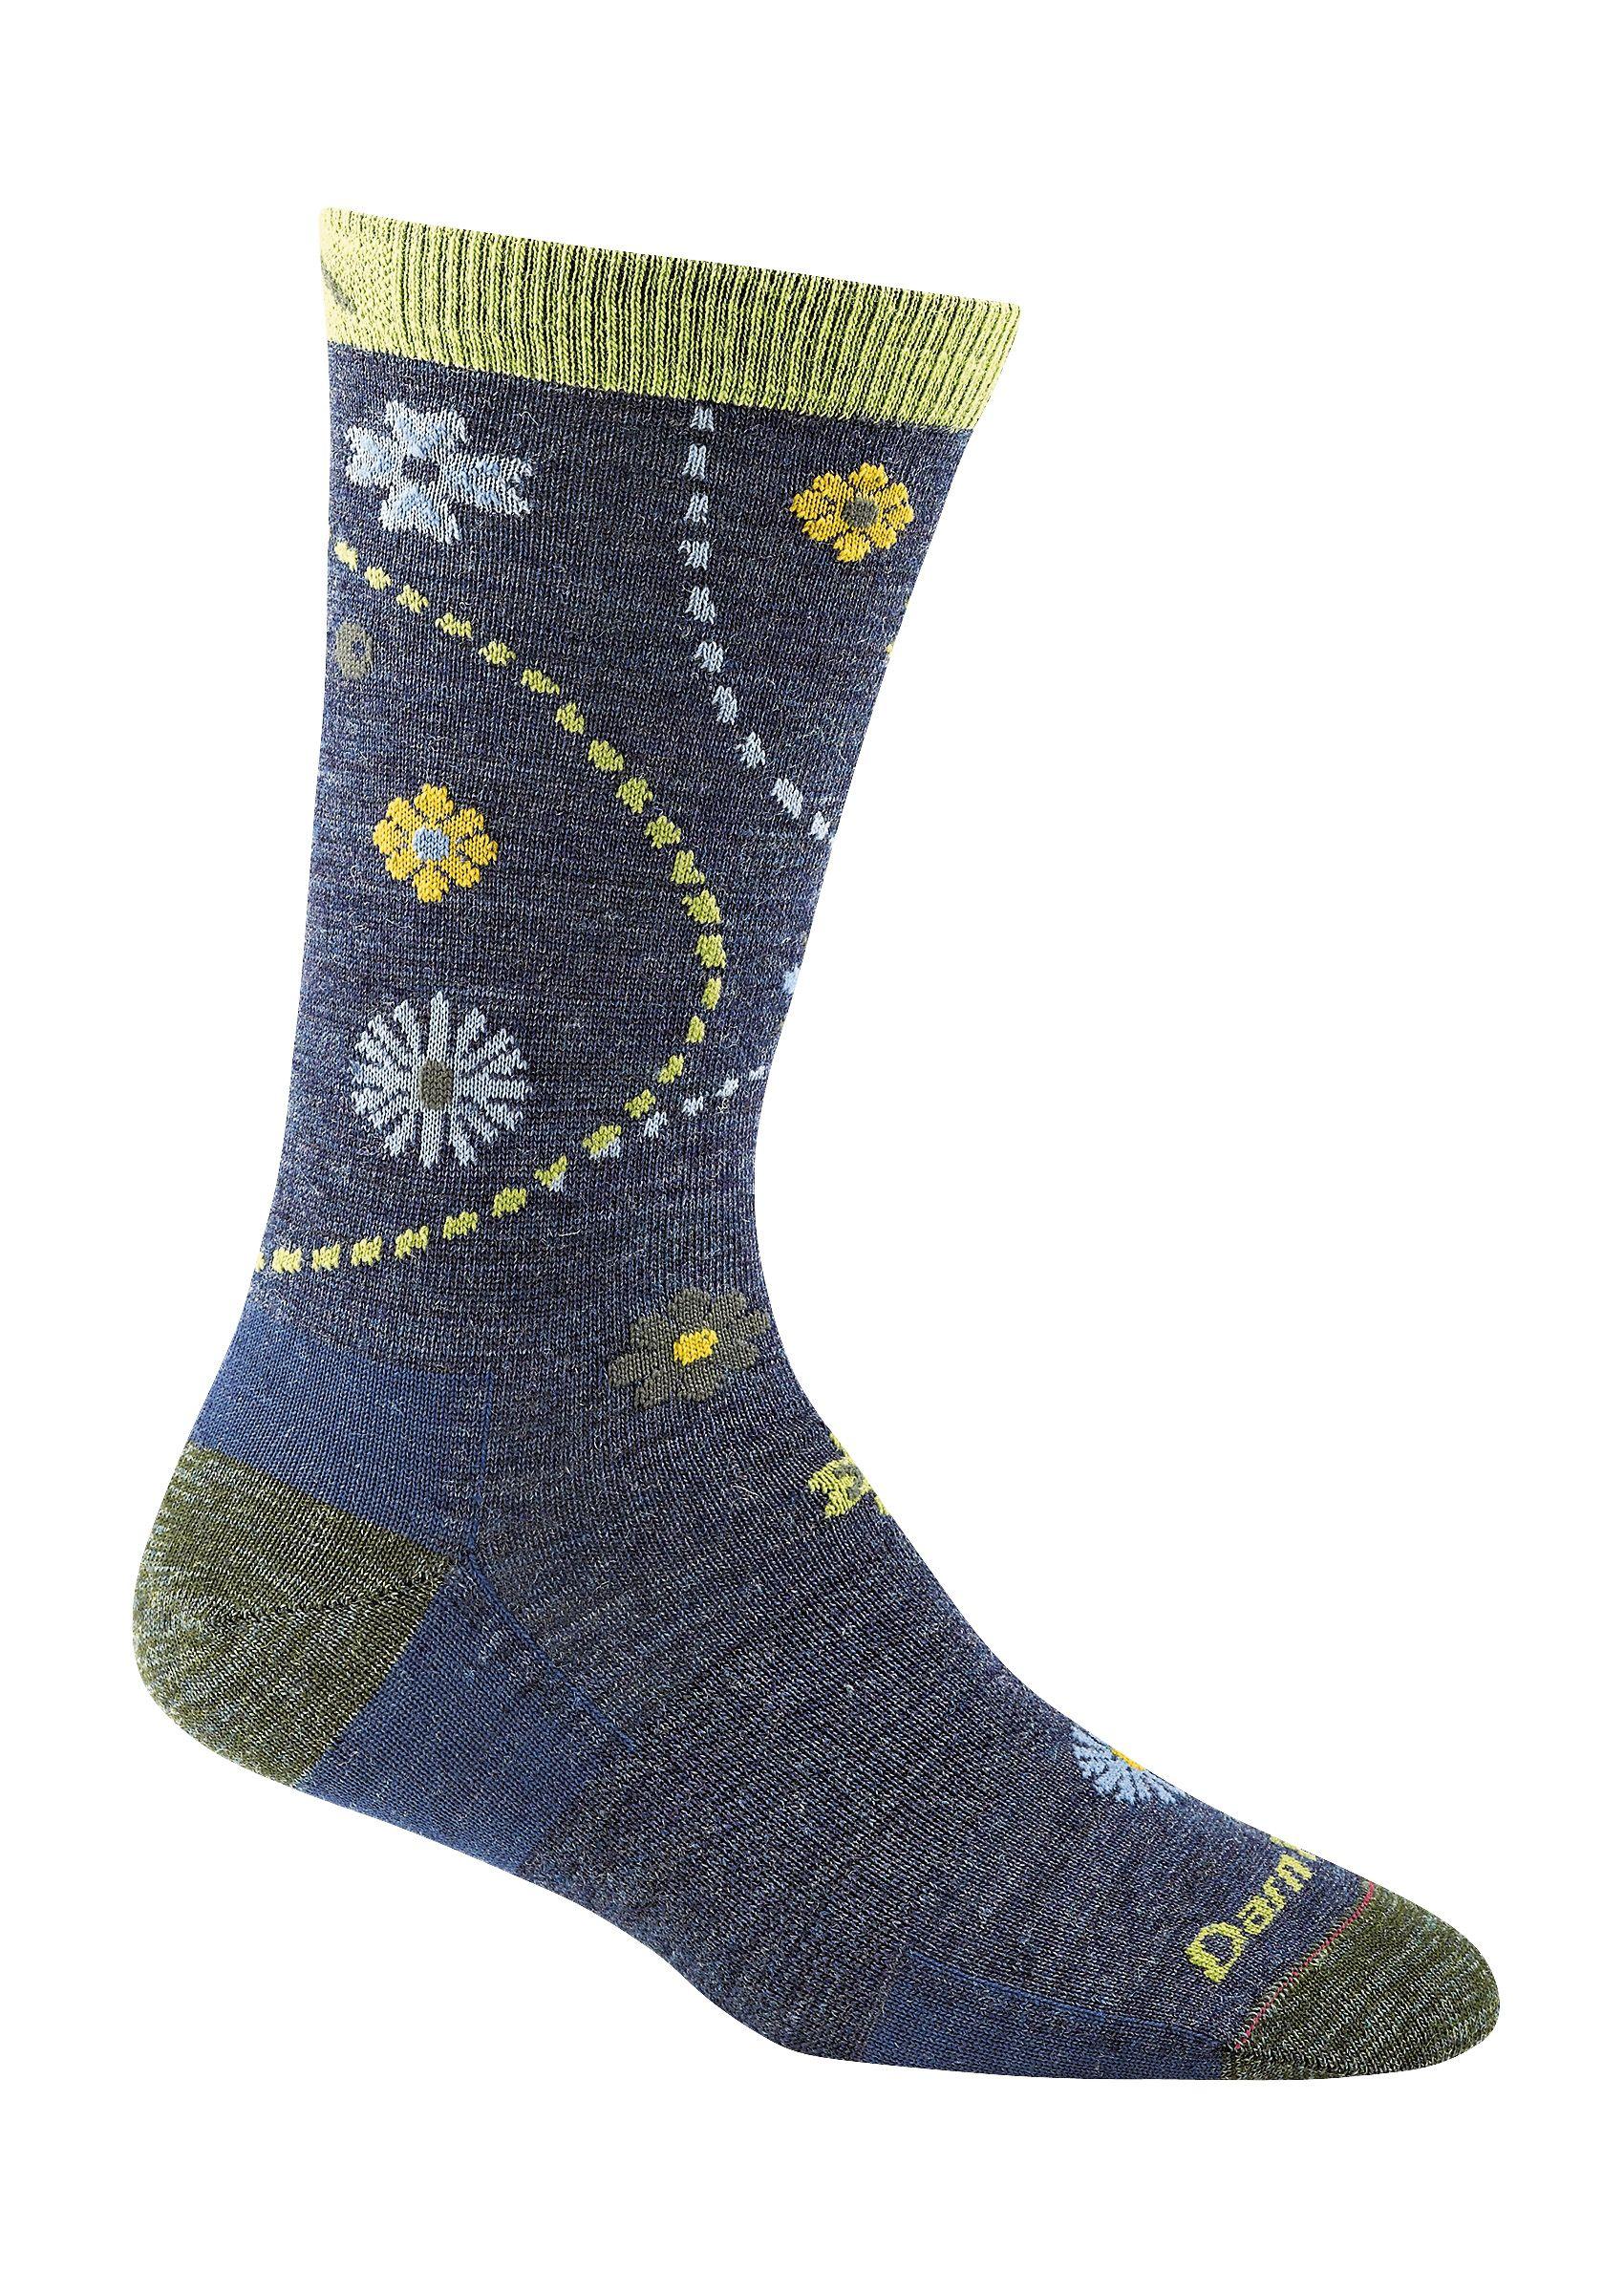 Darn Tough Socks: Garden Light Style, Itch-Free Merino Wool